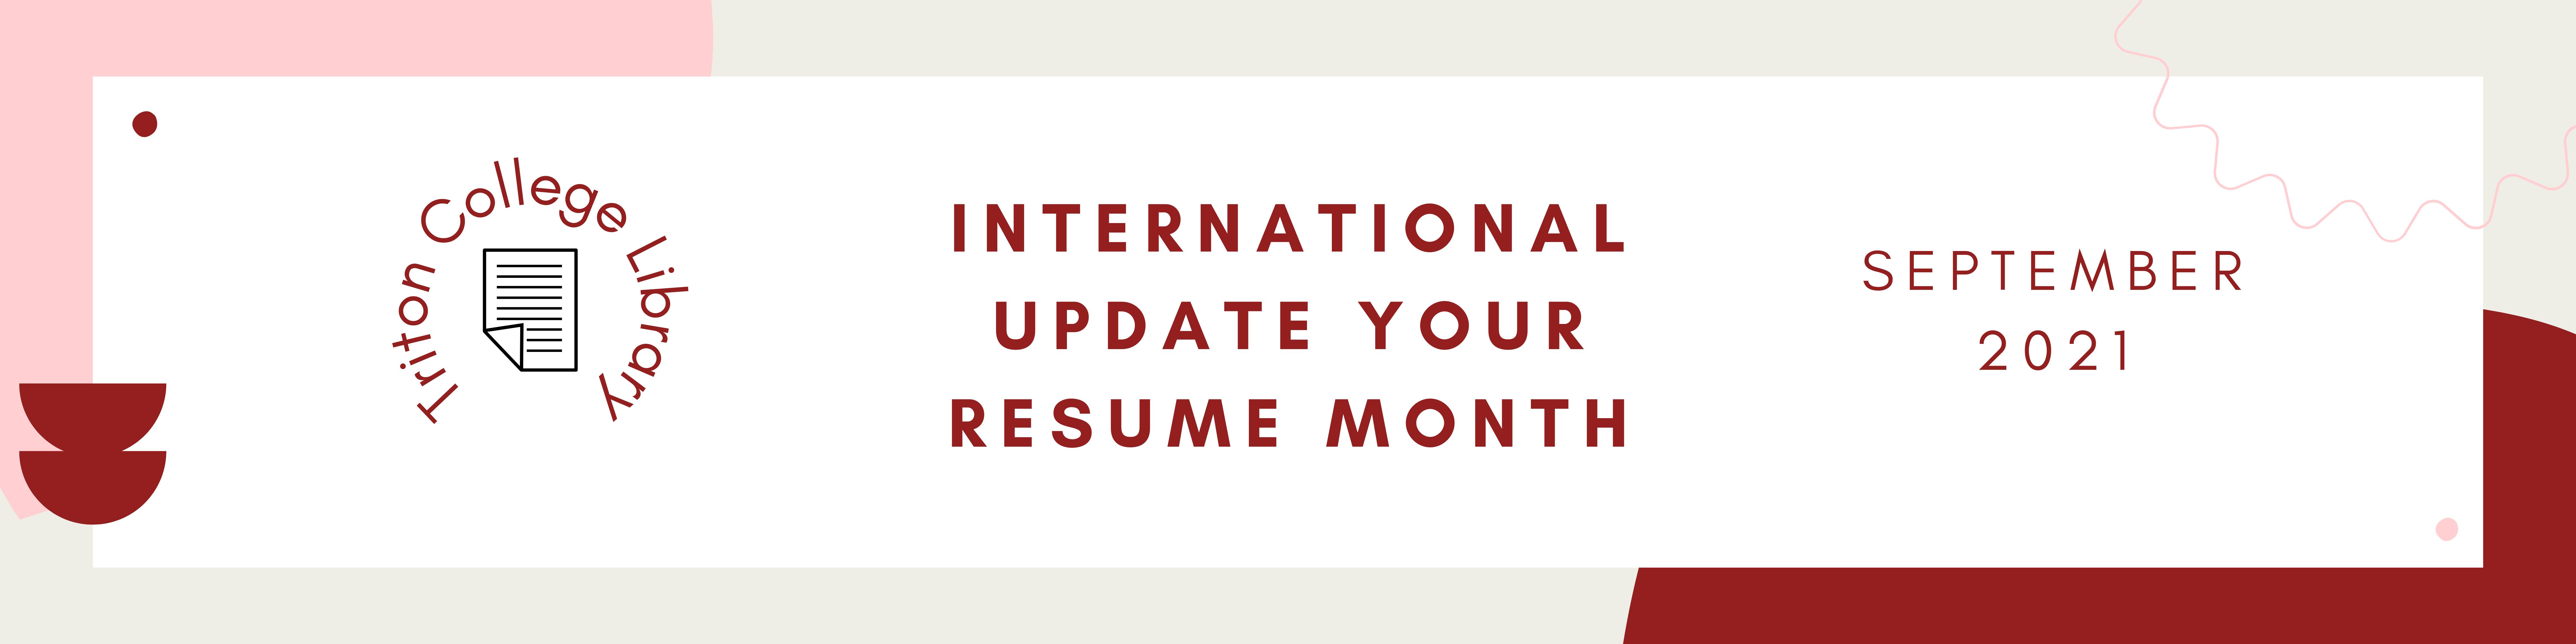 International Update Your Resume Month Banner